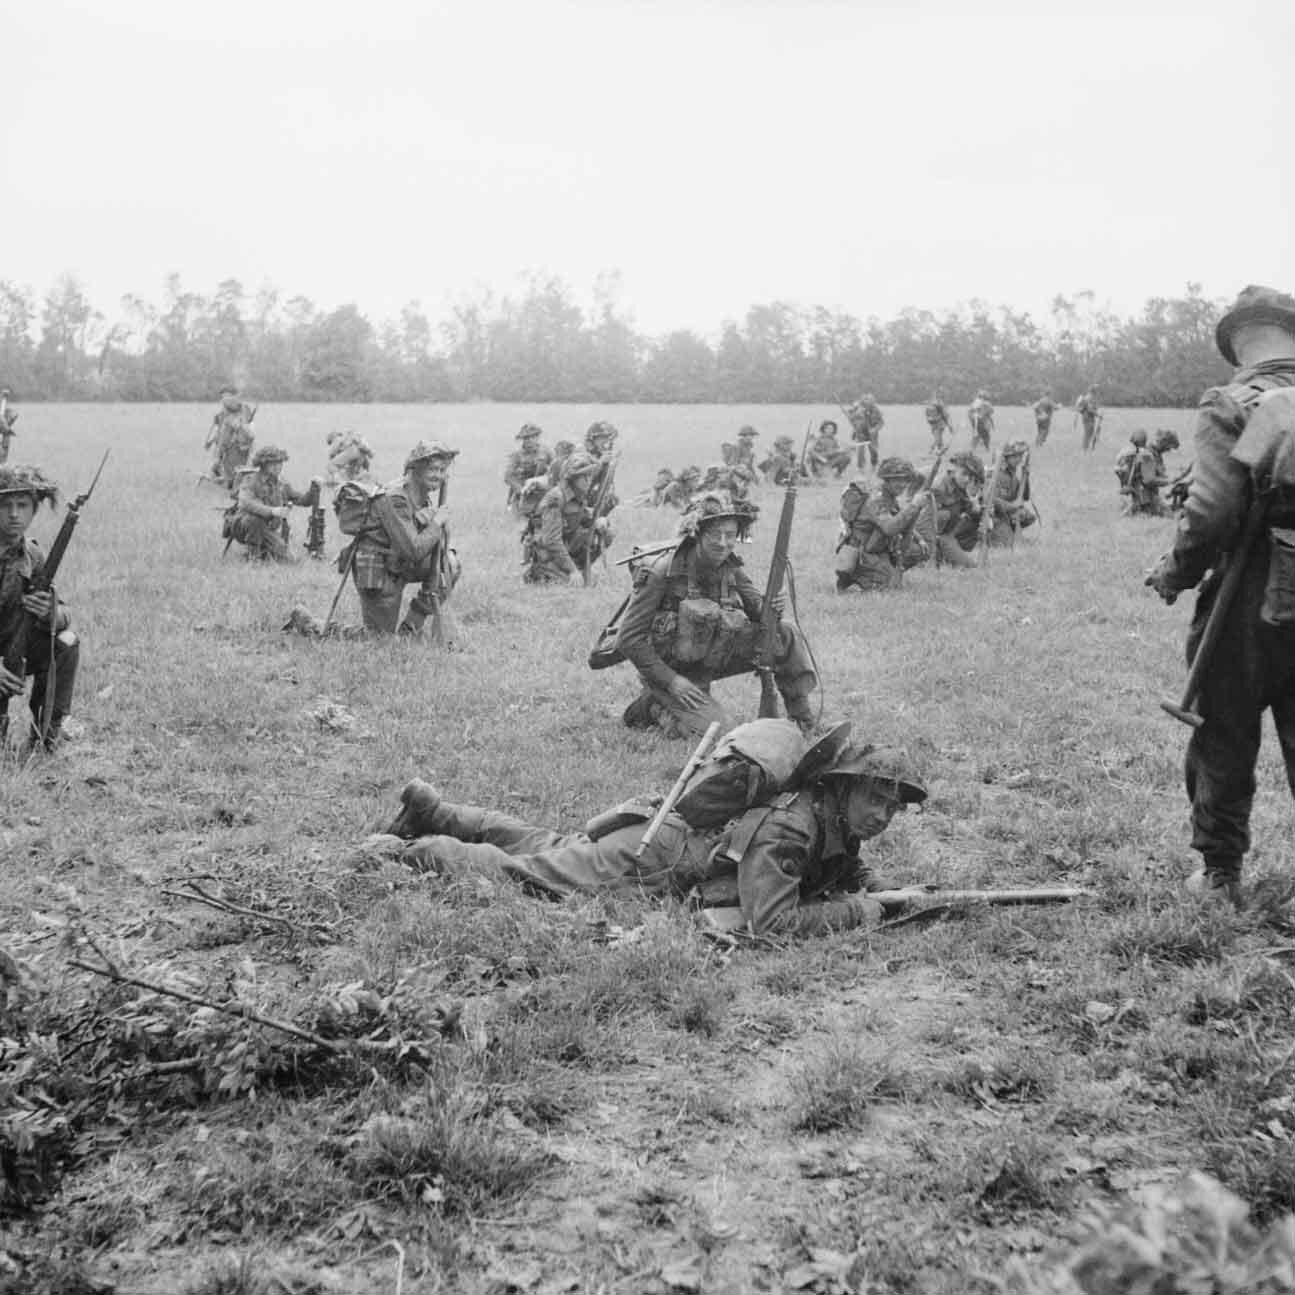 26 June 2021 - 227th Highland Brigade10th Bn, The Highland Light Infantry2nd Bn, The Gordon Highlanders